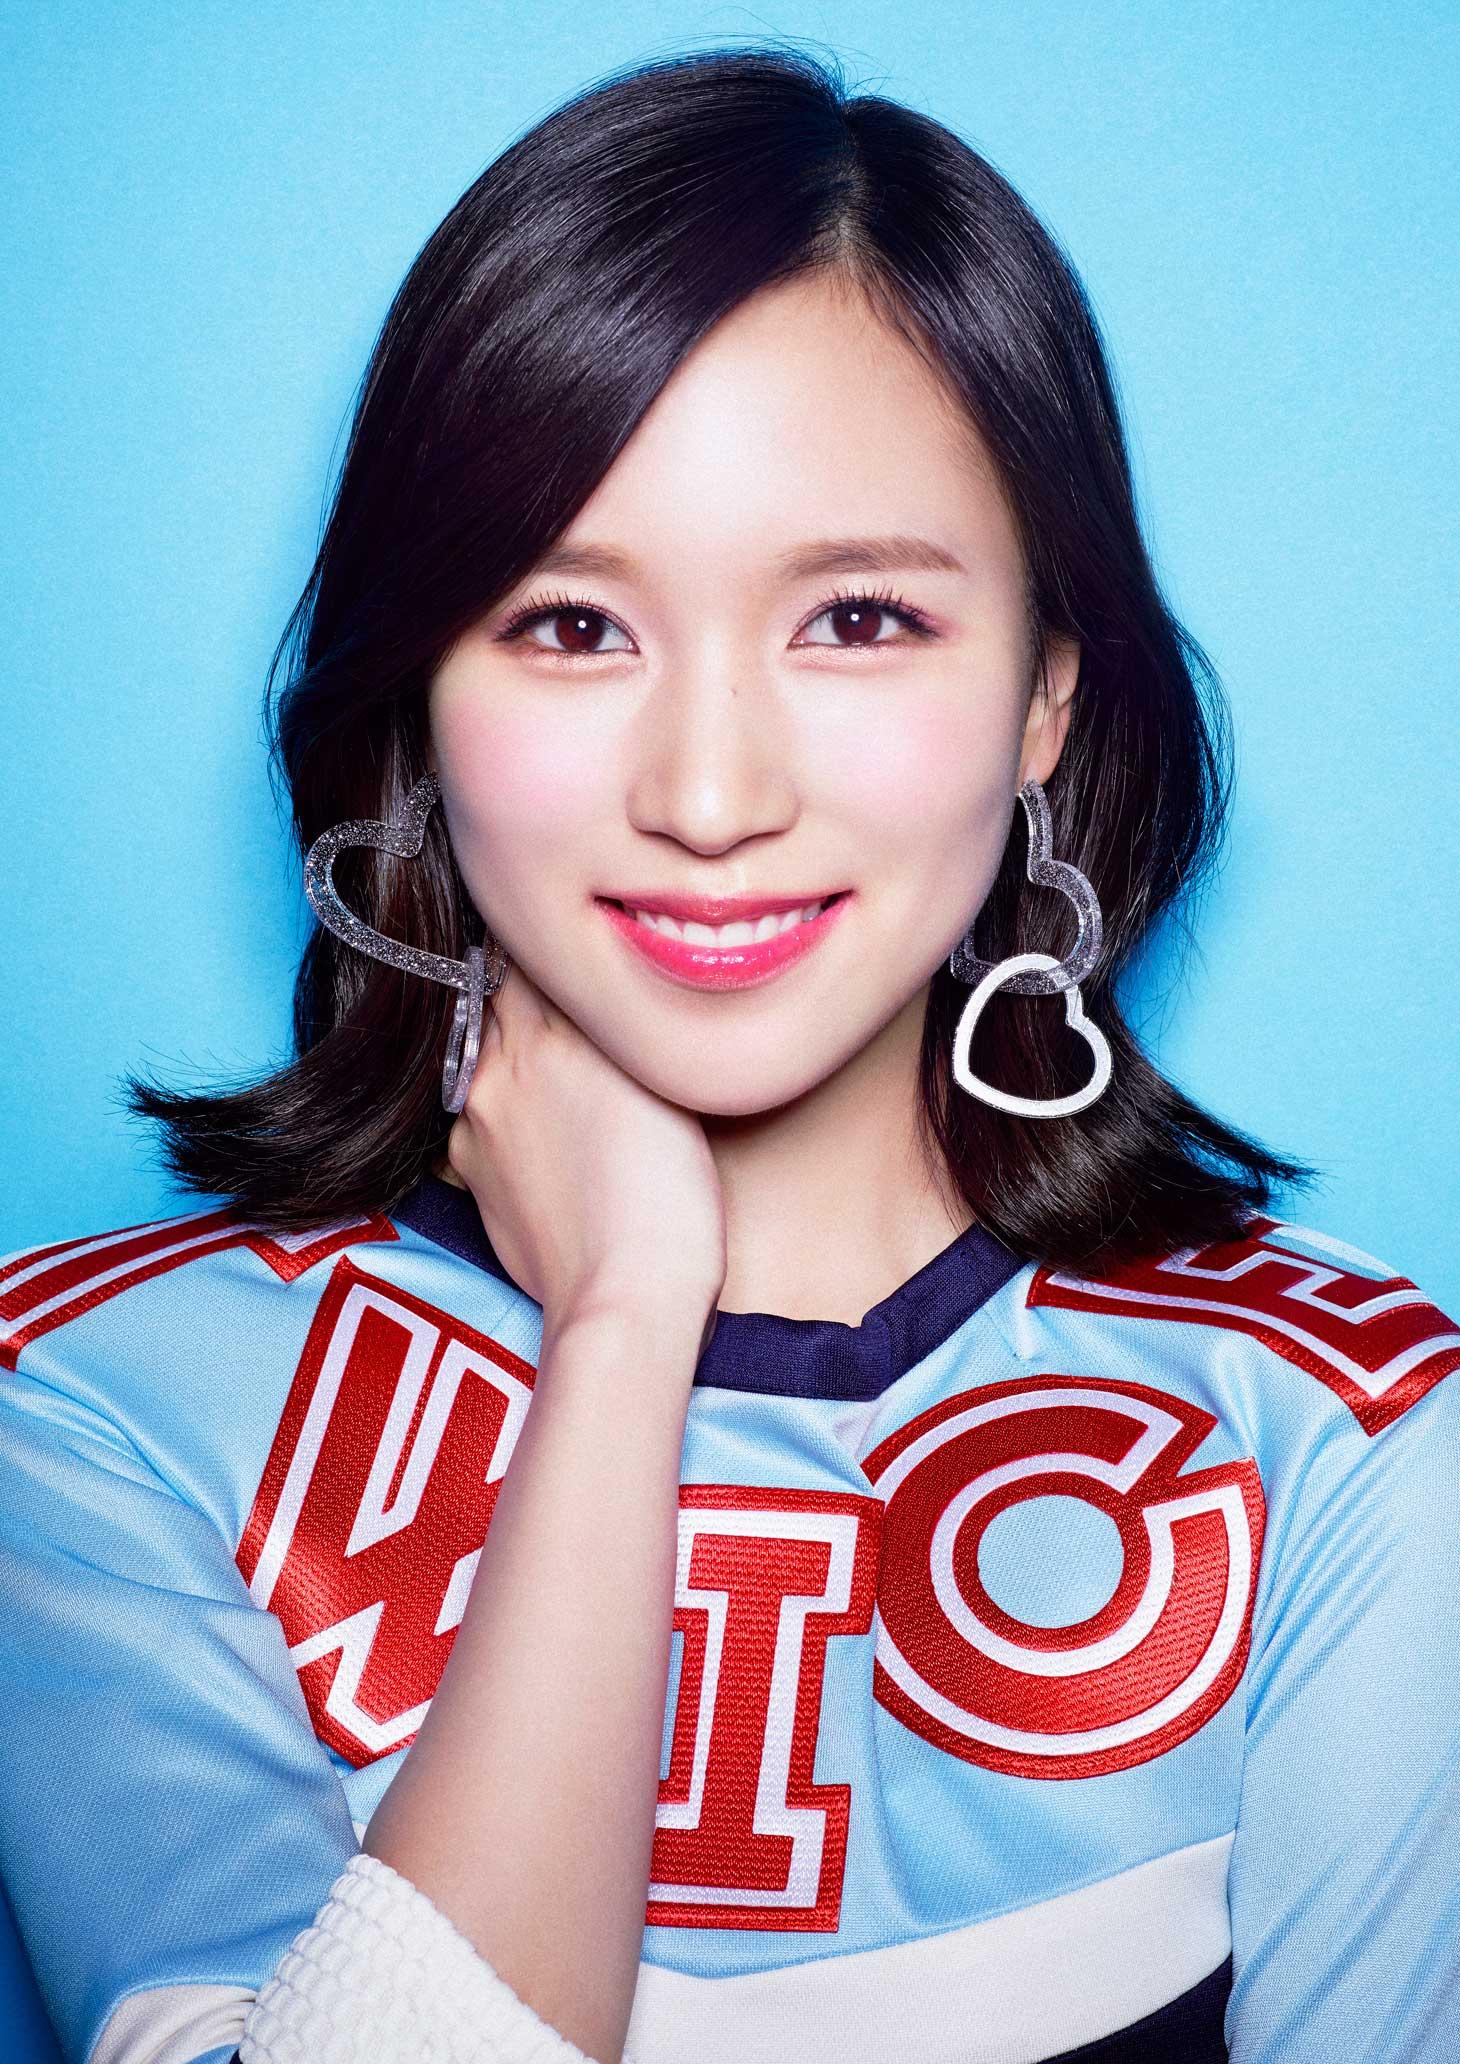 Myoui Mina Android Iphone Wallpaper Asiachan Kpop Jpop Image Board